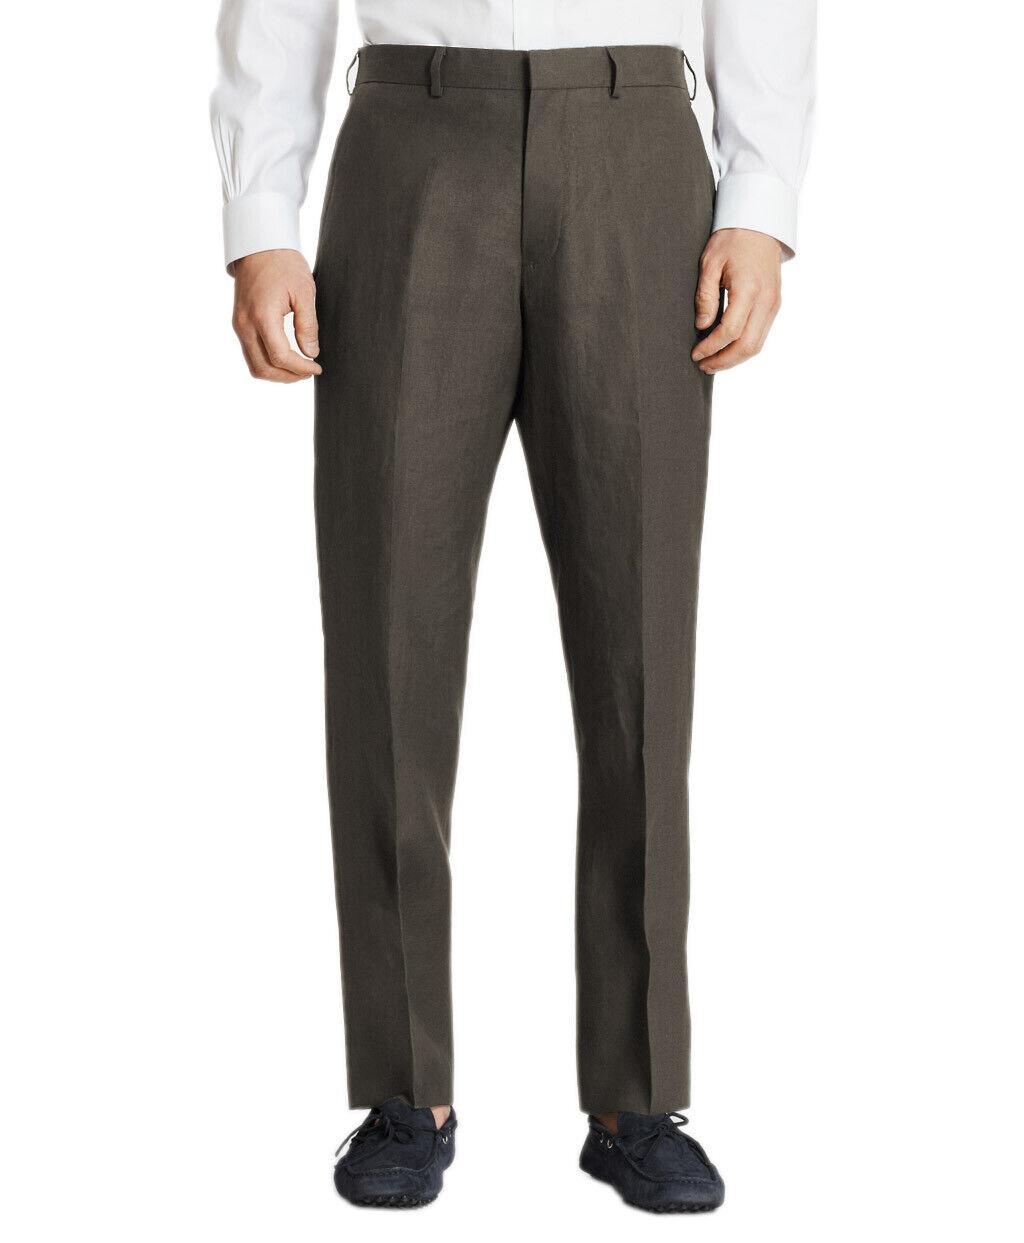 Brooks Bredhers Mens Taup Brown Regent Linen Flat Front Pants 38R Regular 8630-4